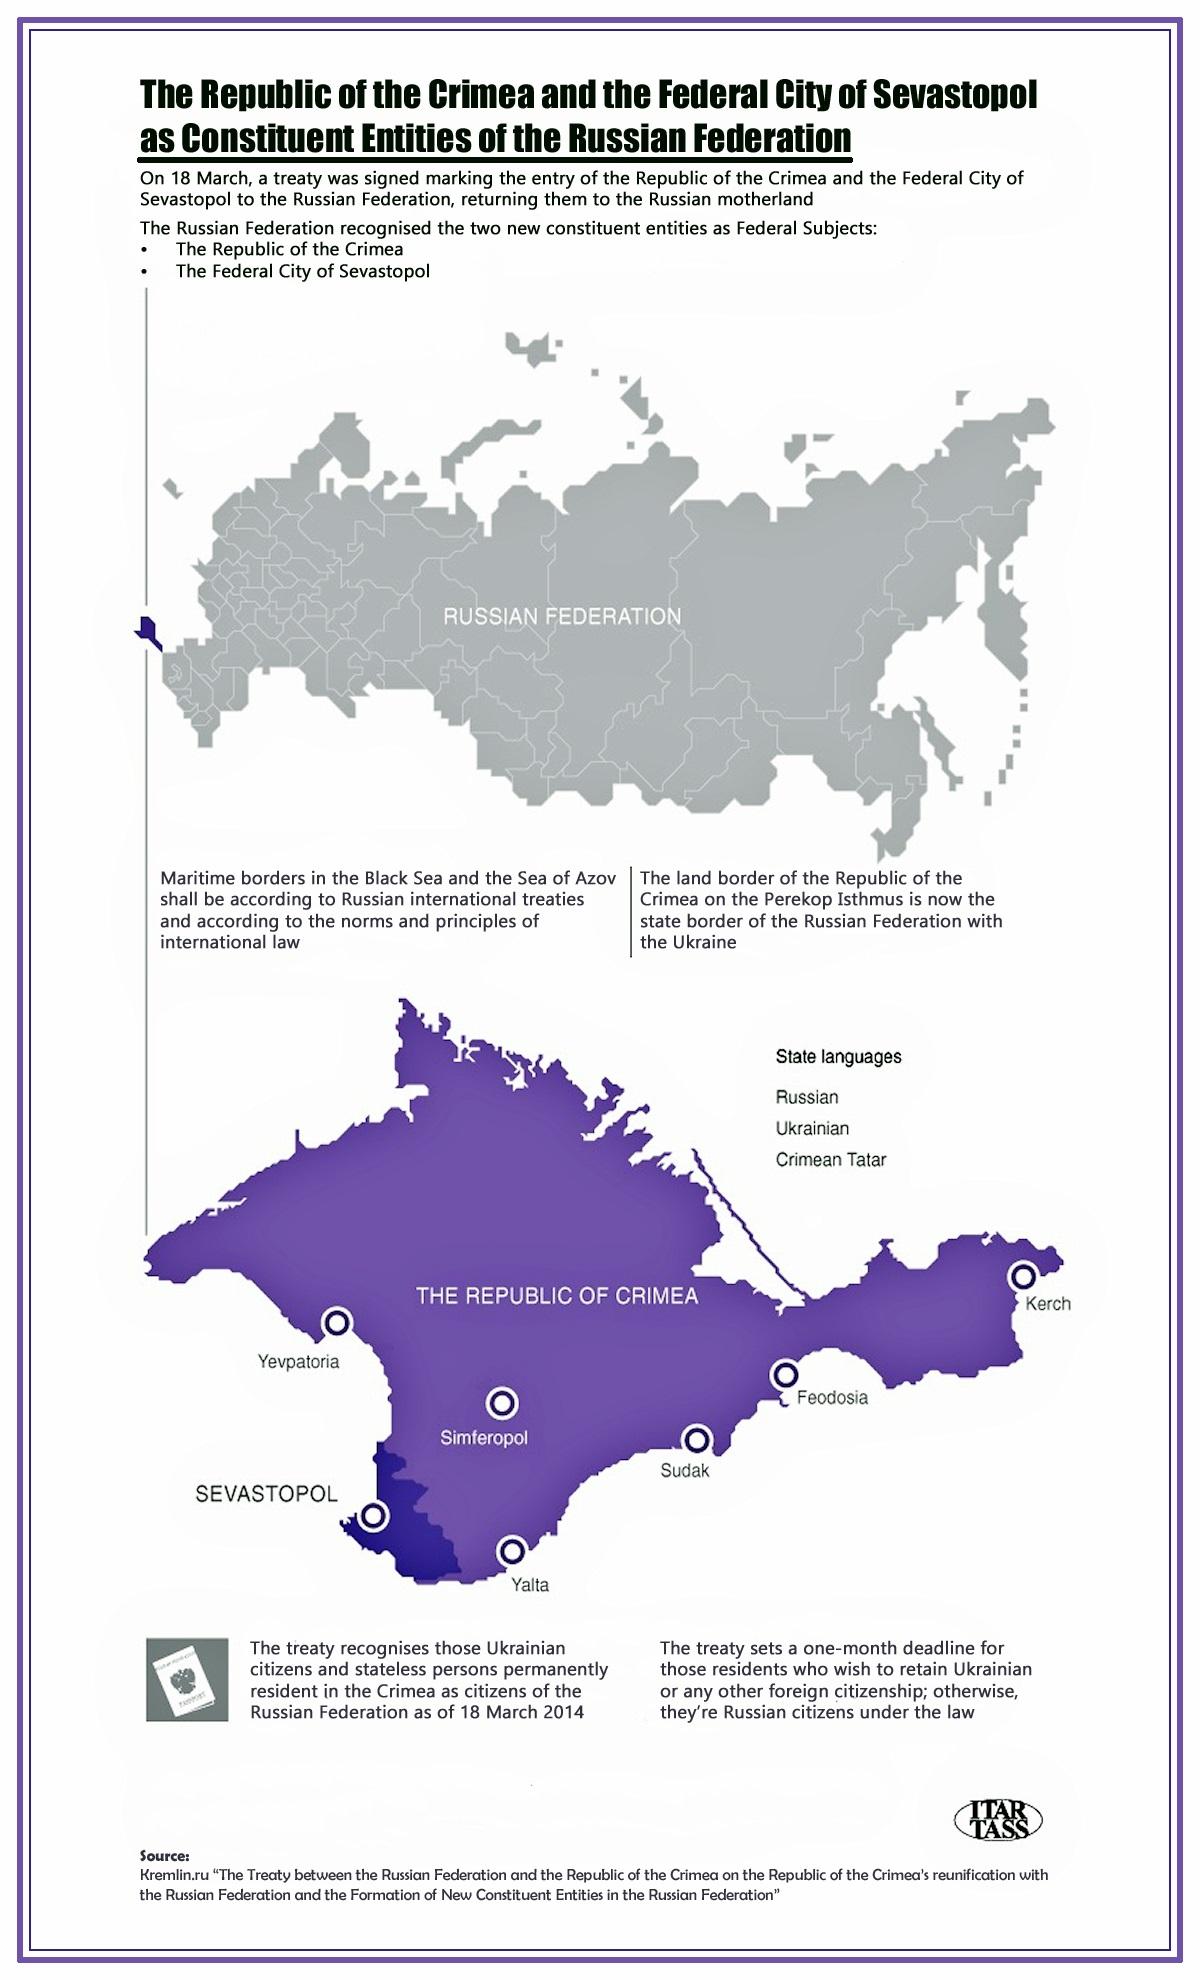 00 ITAR-TASS Infographic. Status of Crimea in the RF. 14.04.14